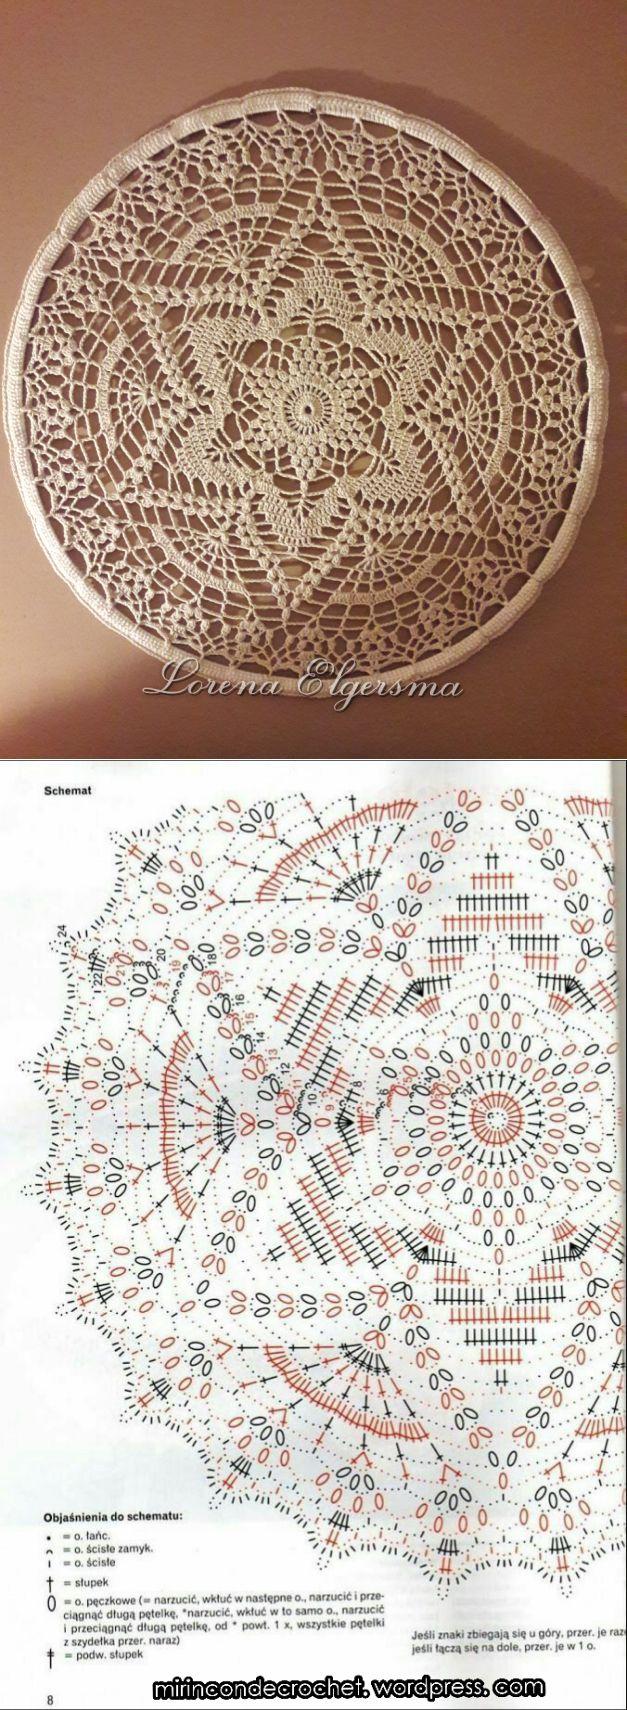 453 best crochet images on Pinterest | Crochet patterns, Doilies ...